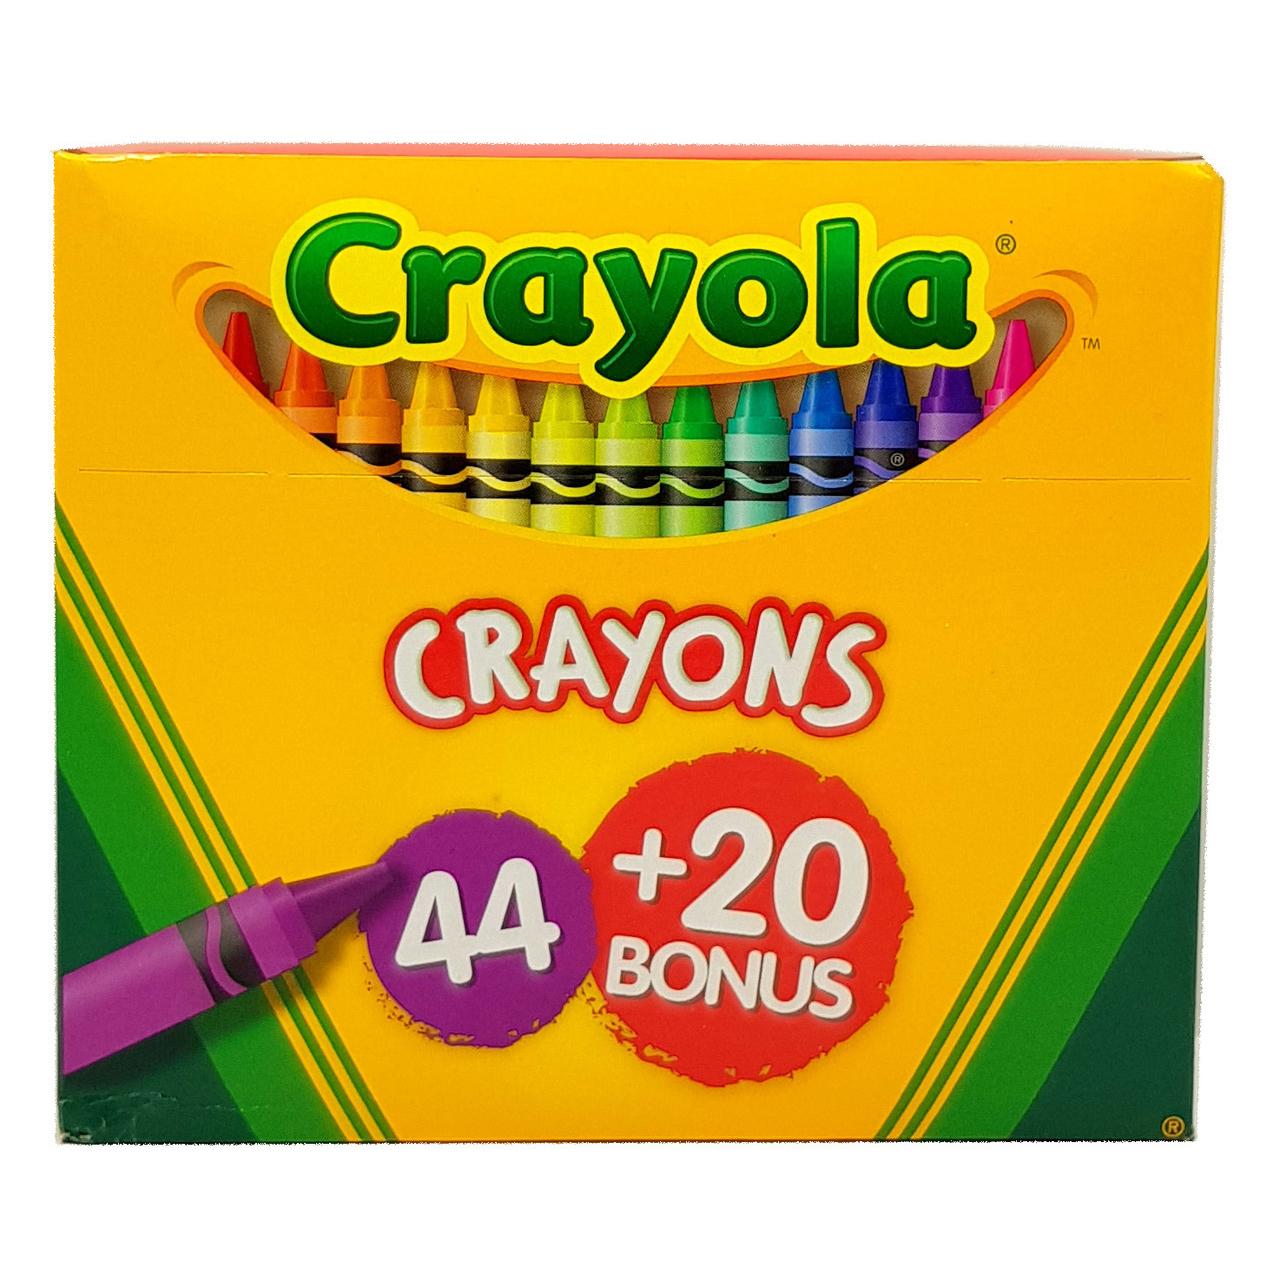 Crayola 44 Crayons + 20 Bonus Pack